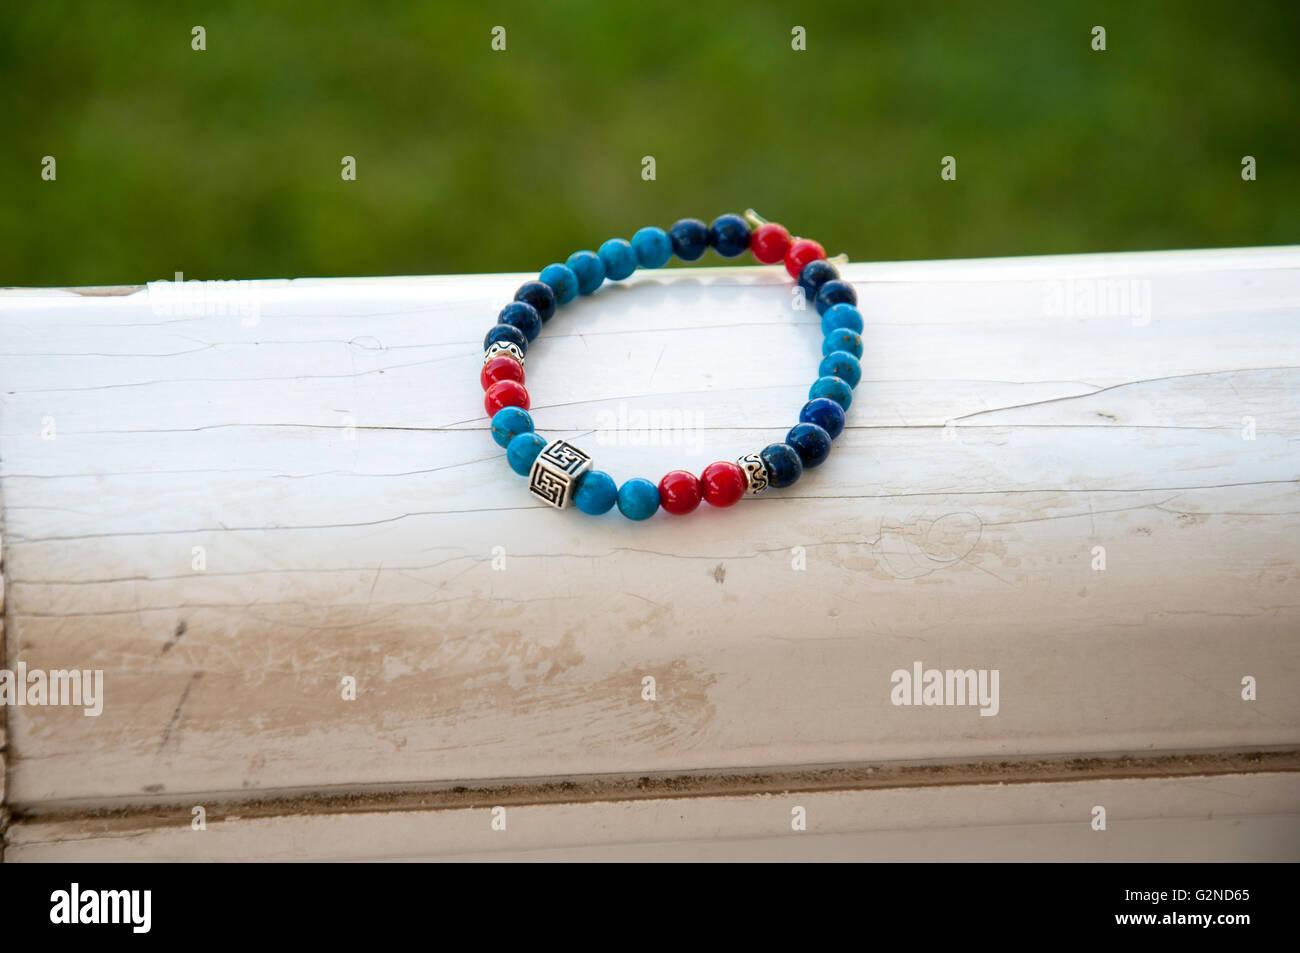 bead bracelet on the wood - Stock Image